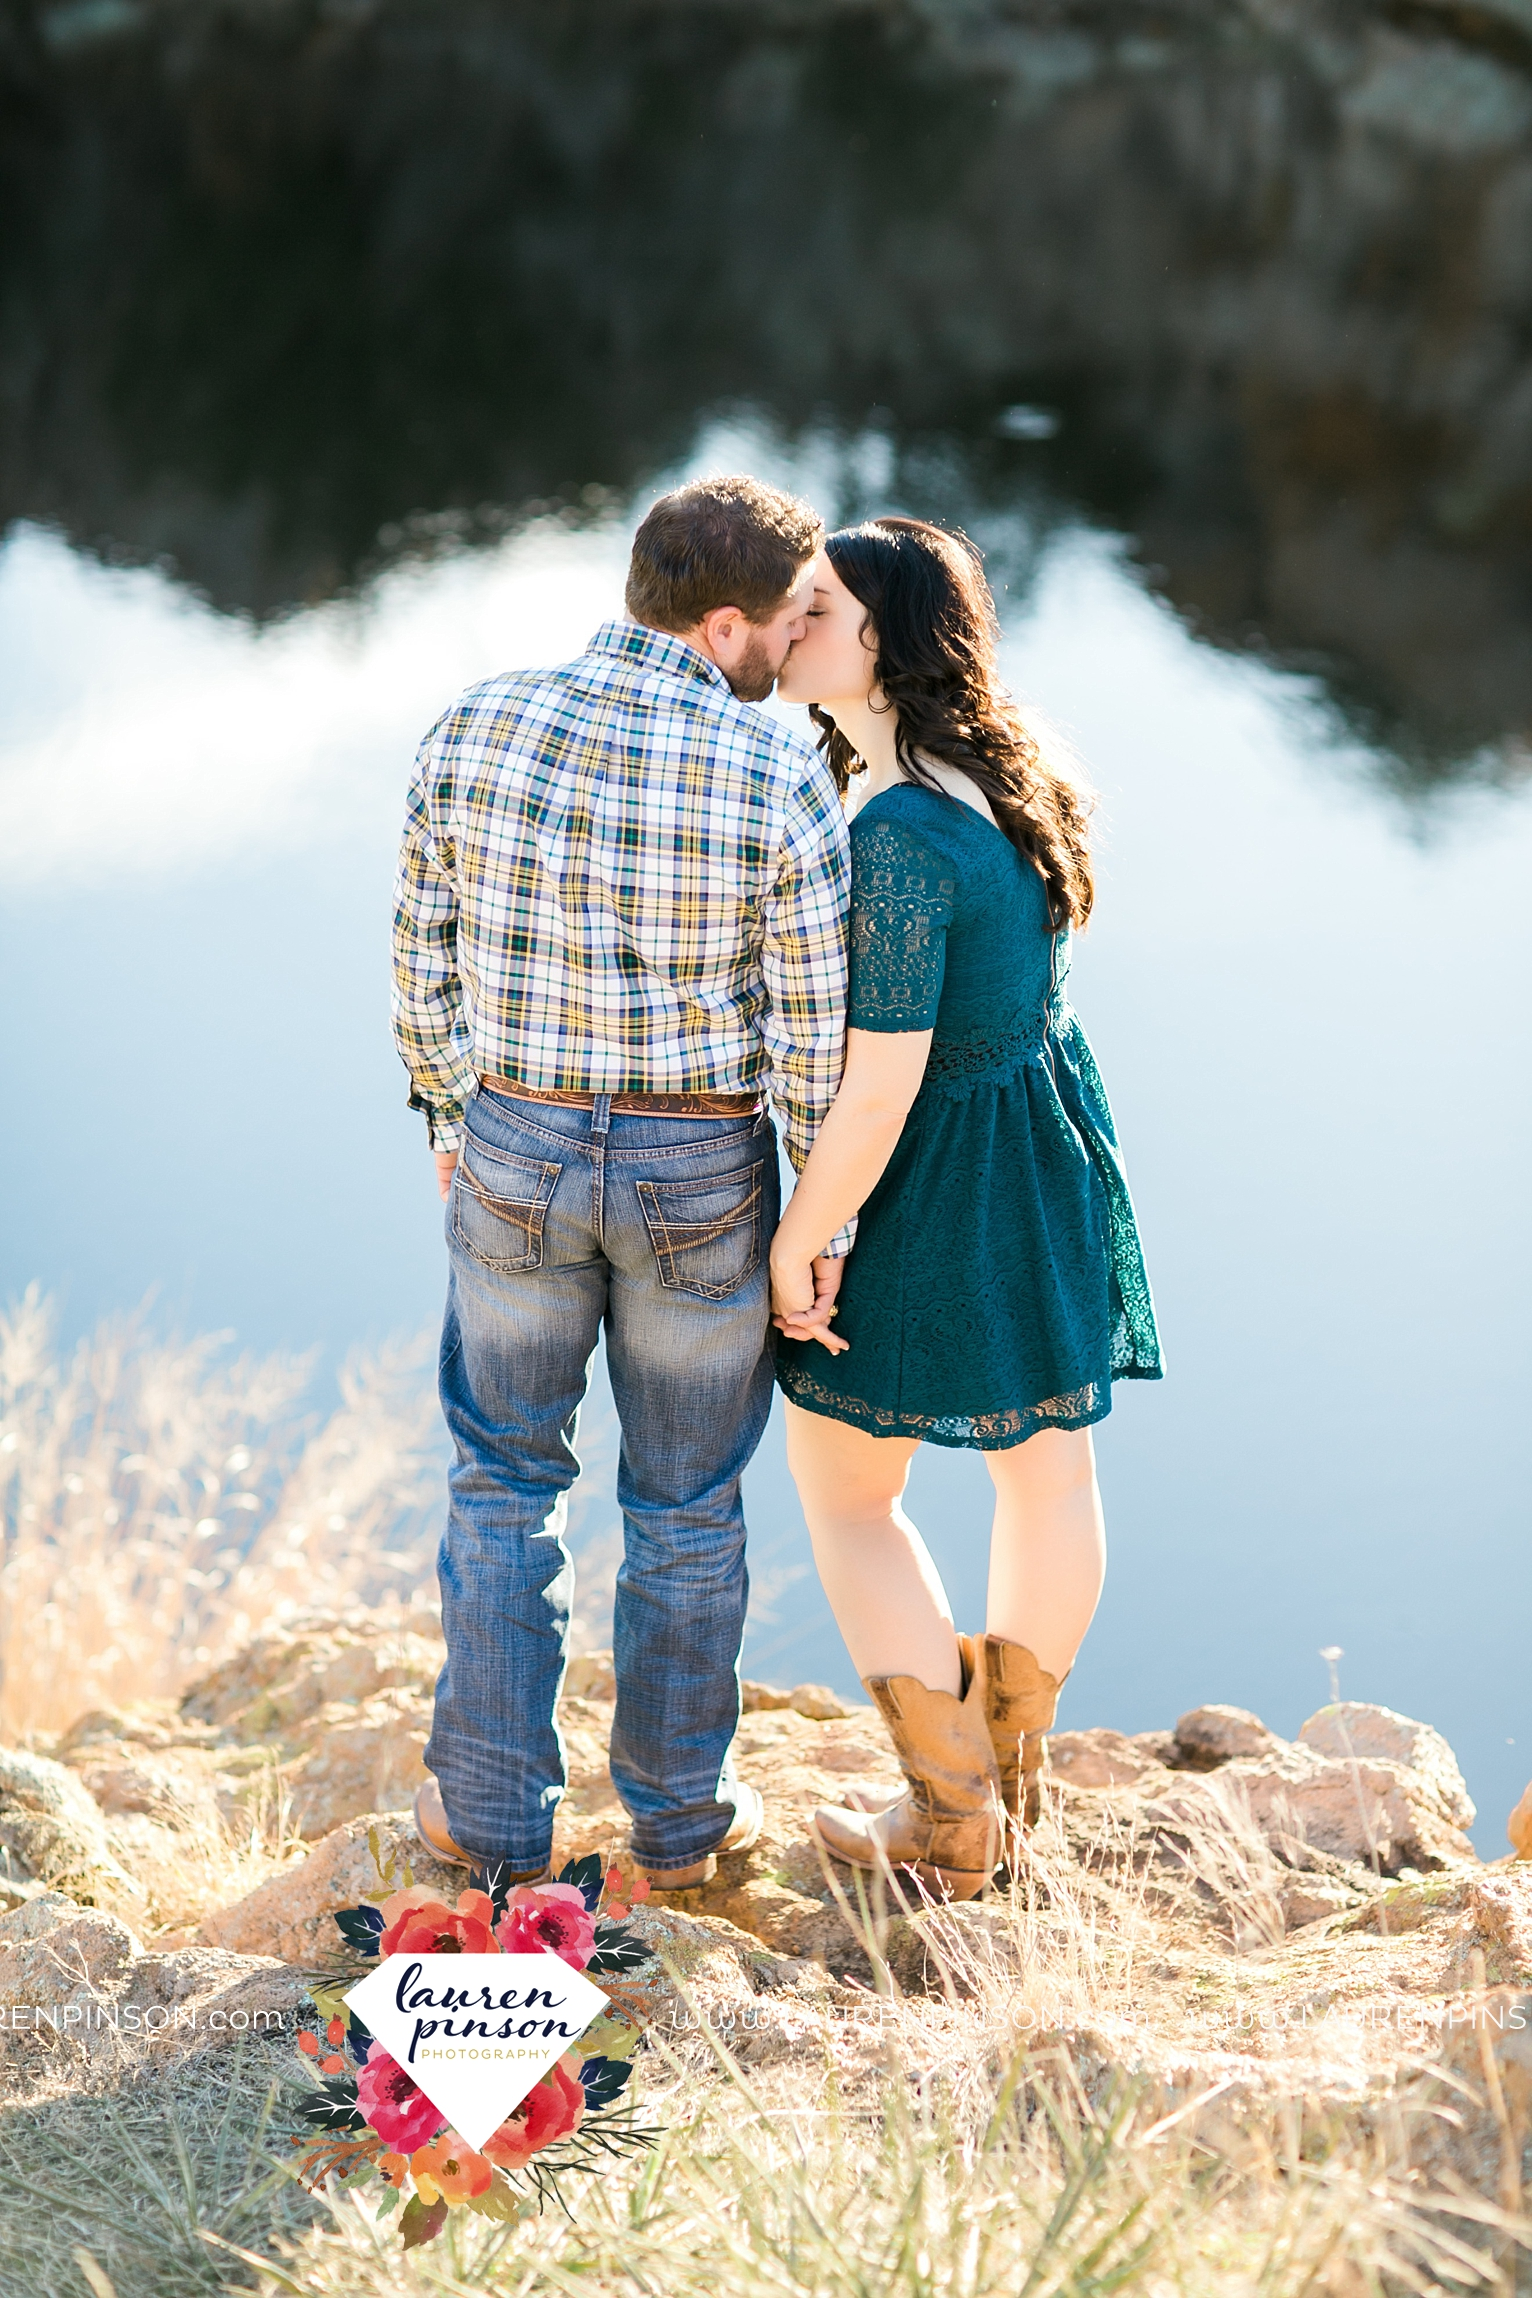 wichita-falls-texas-engagement-photographer-wedding-oklahoma-lawton-wichita-mountains-refuge-outdoors-mountains-engaged_2055.jpg